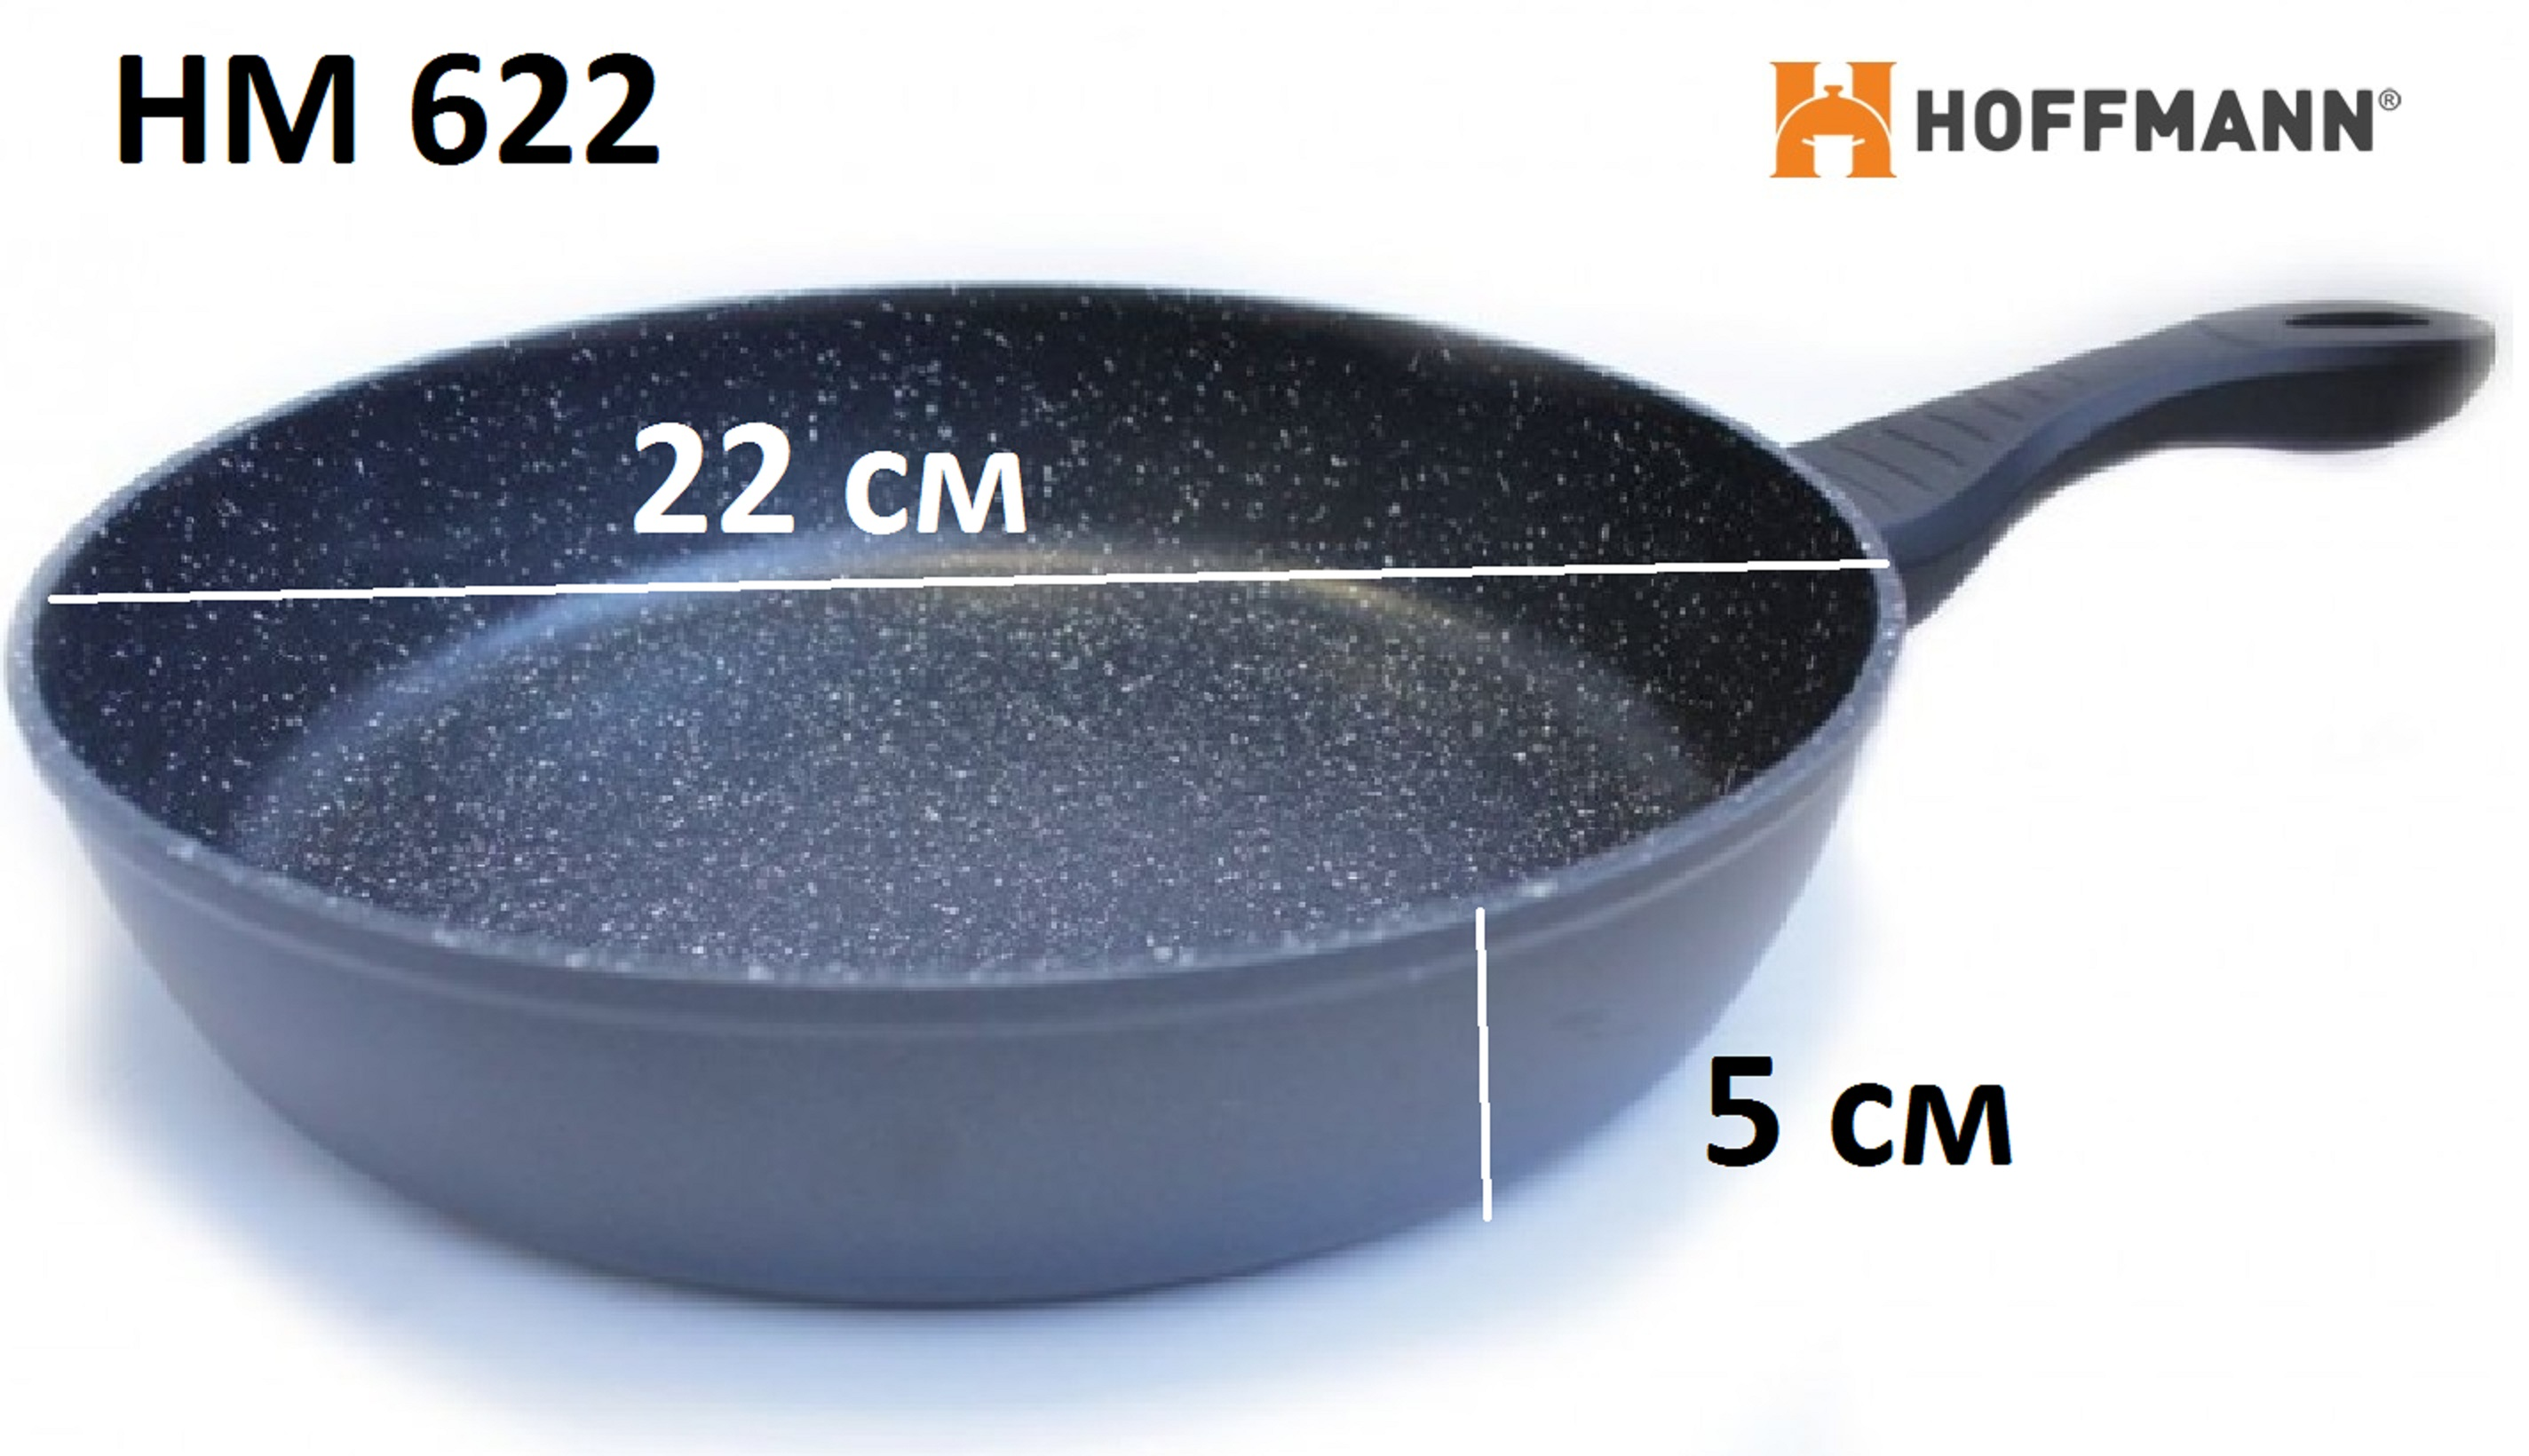 Сковорода с мраморным покрытием HOFFMANN HM 622 без крышки